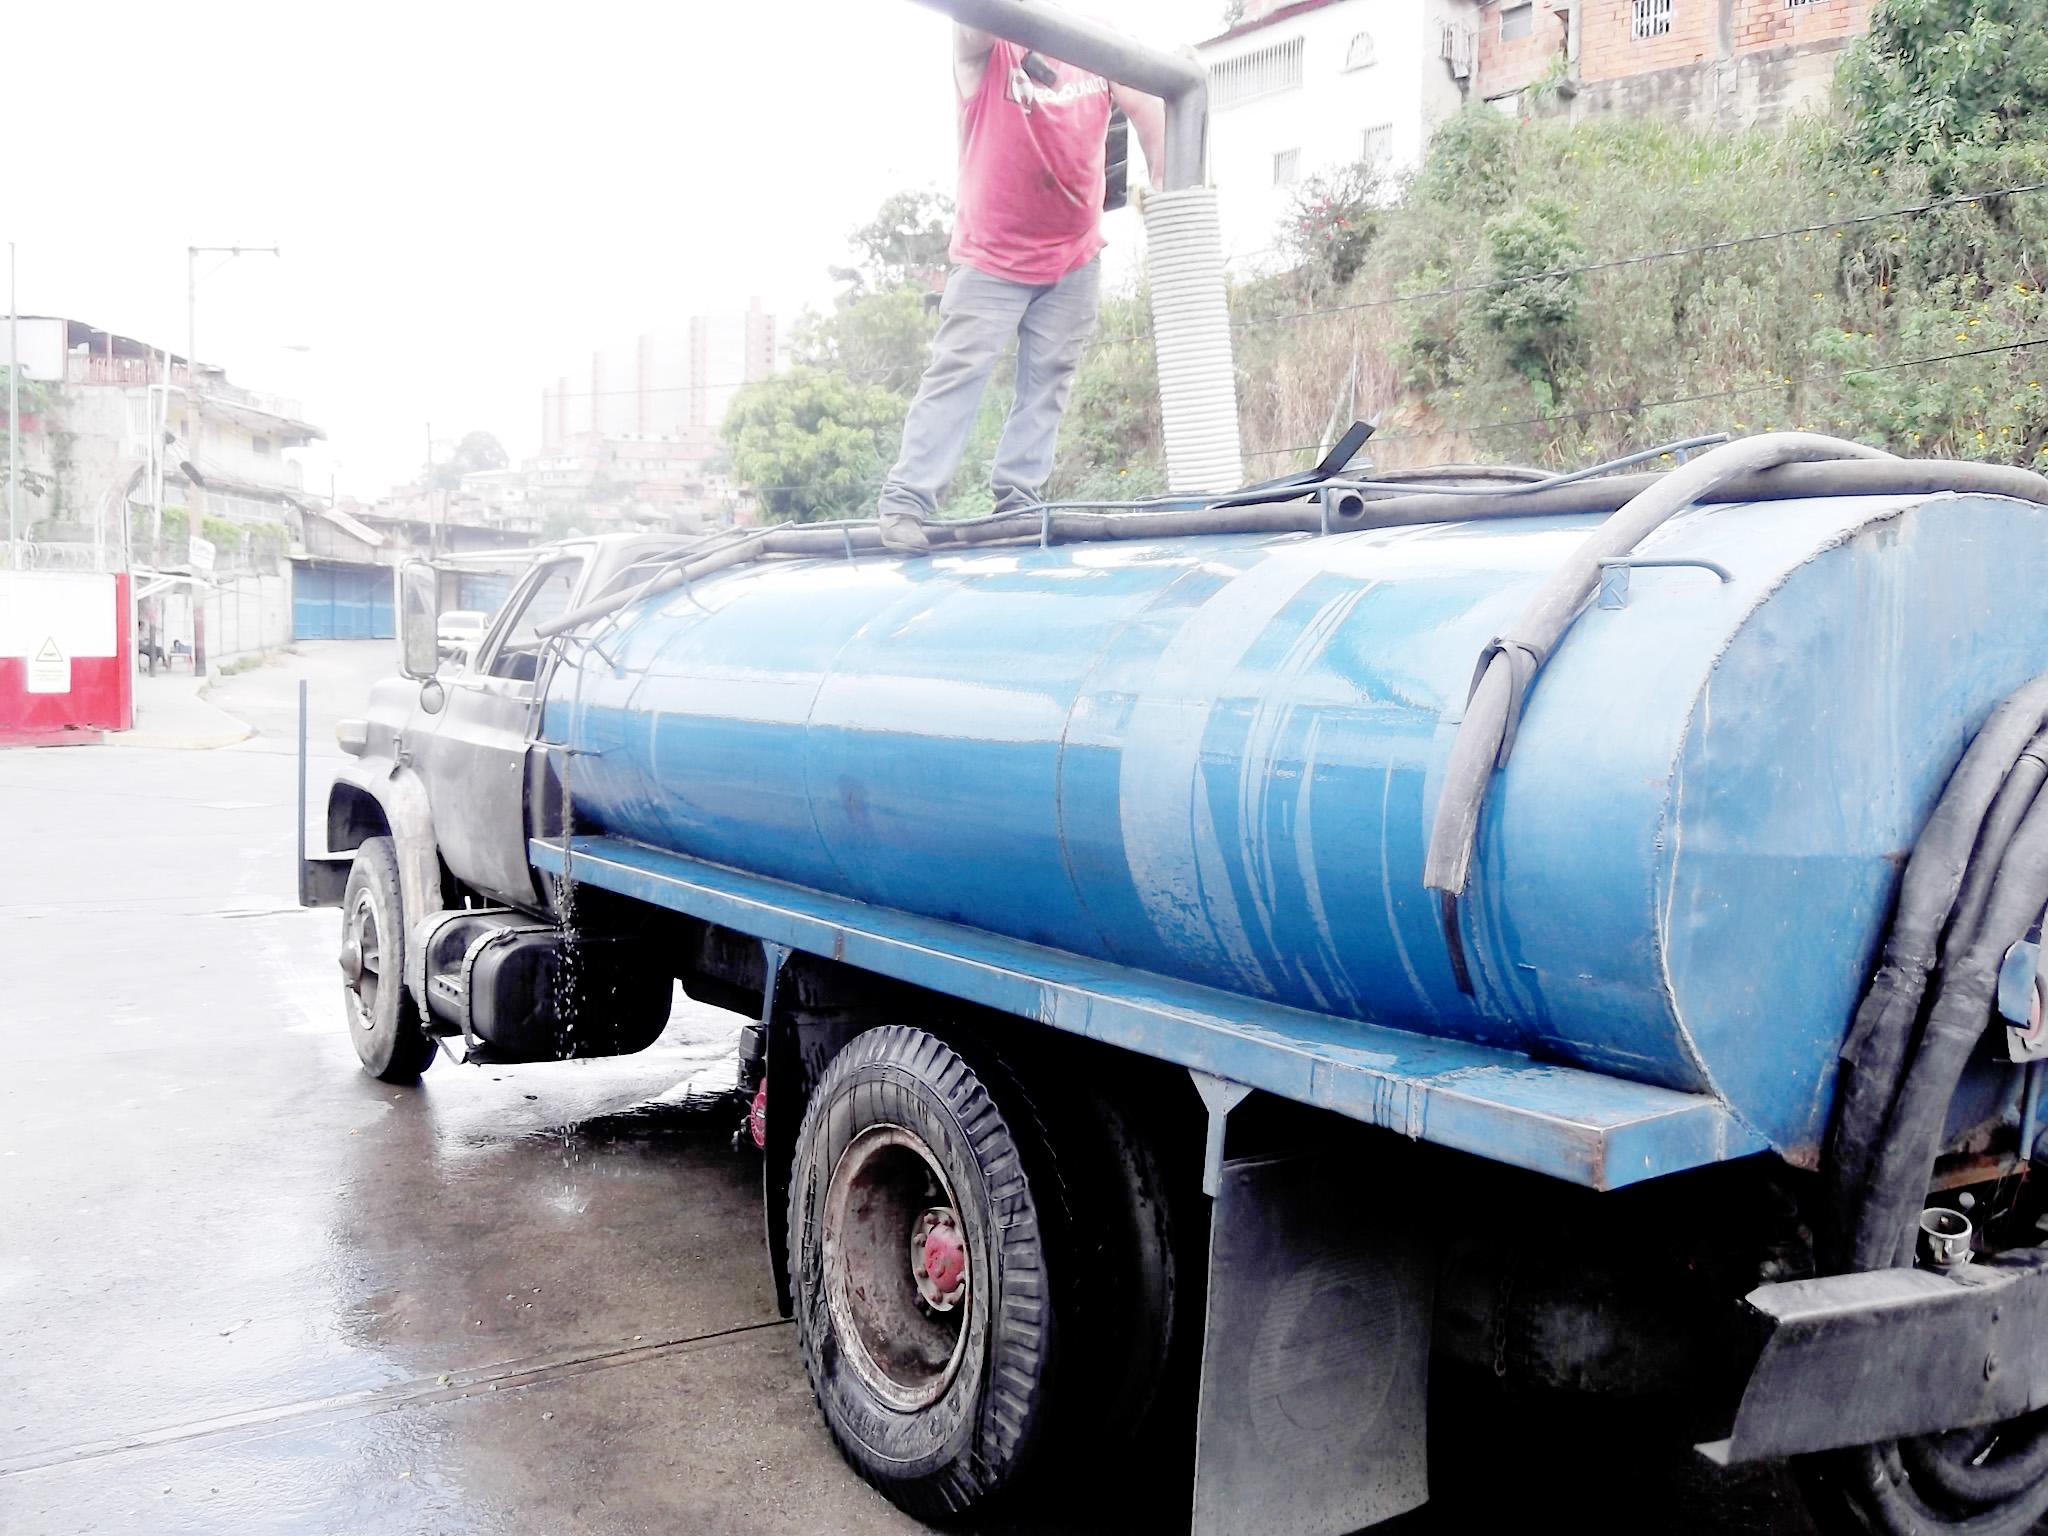 cisternas de agua a domicilio affordable de agua camin